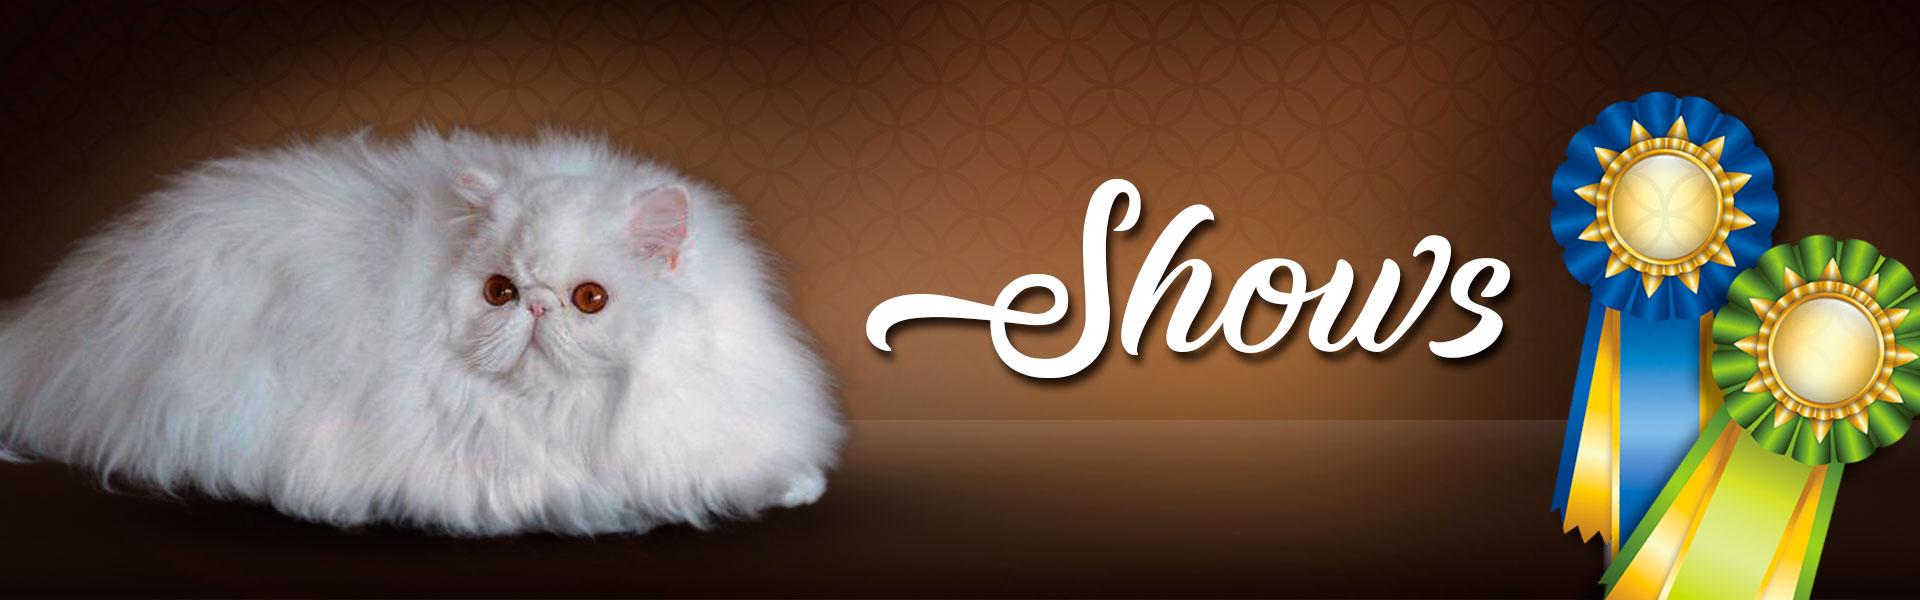 Tishacats - Shows